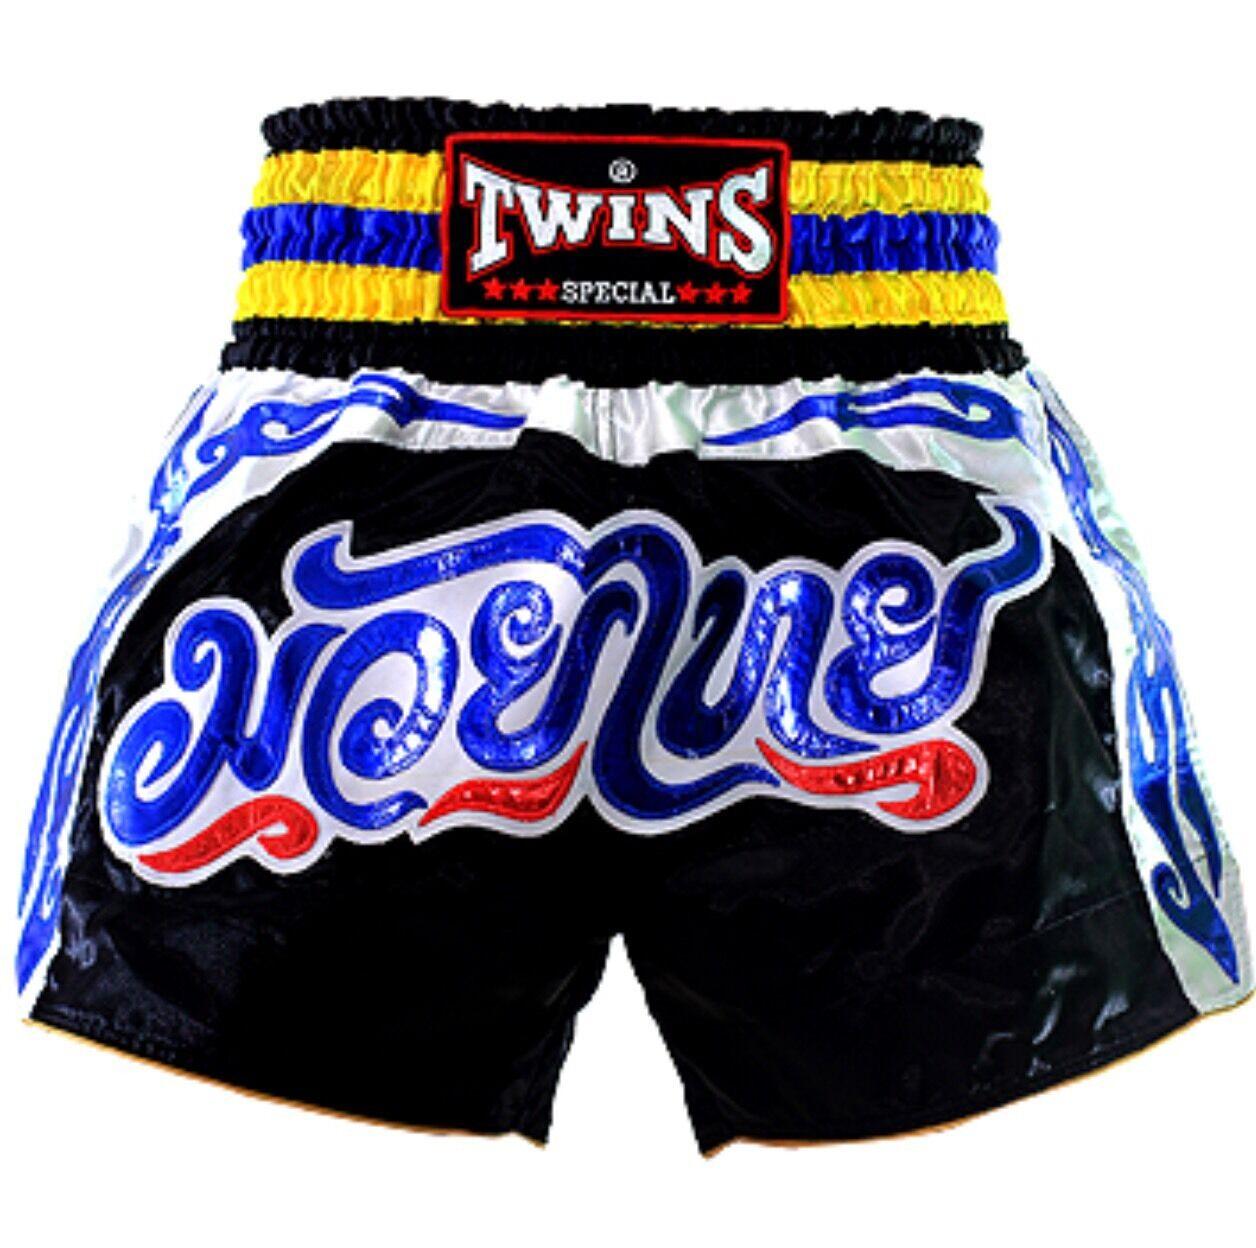 TWINS SPECIAL MUAY THAI Pantaloncini Taglia XL